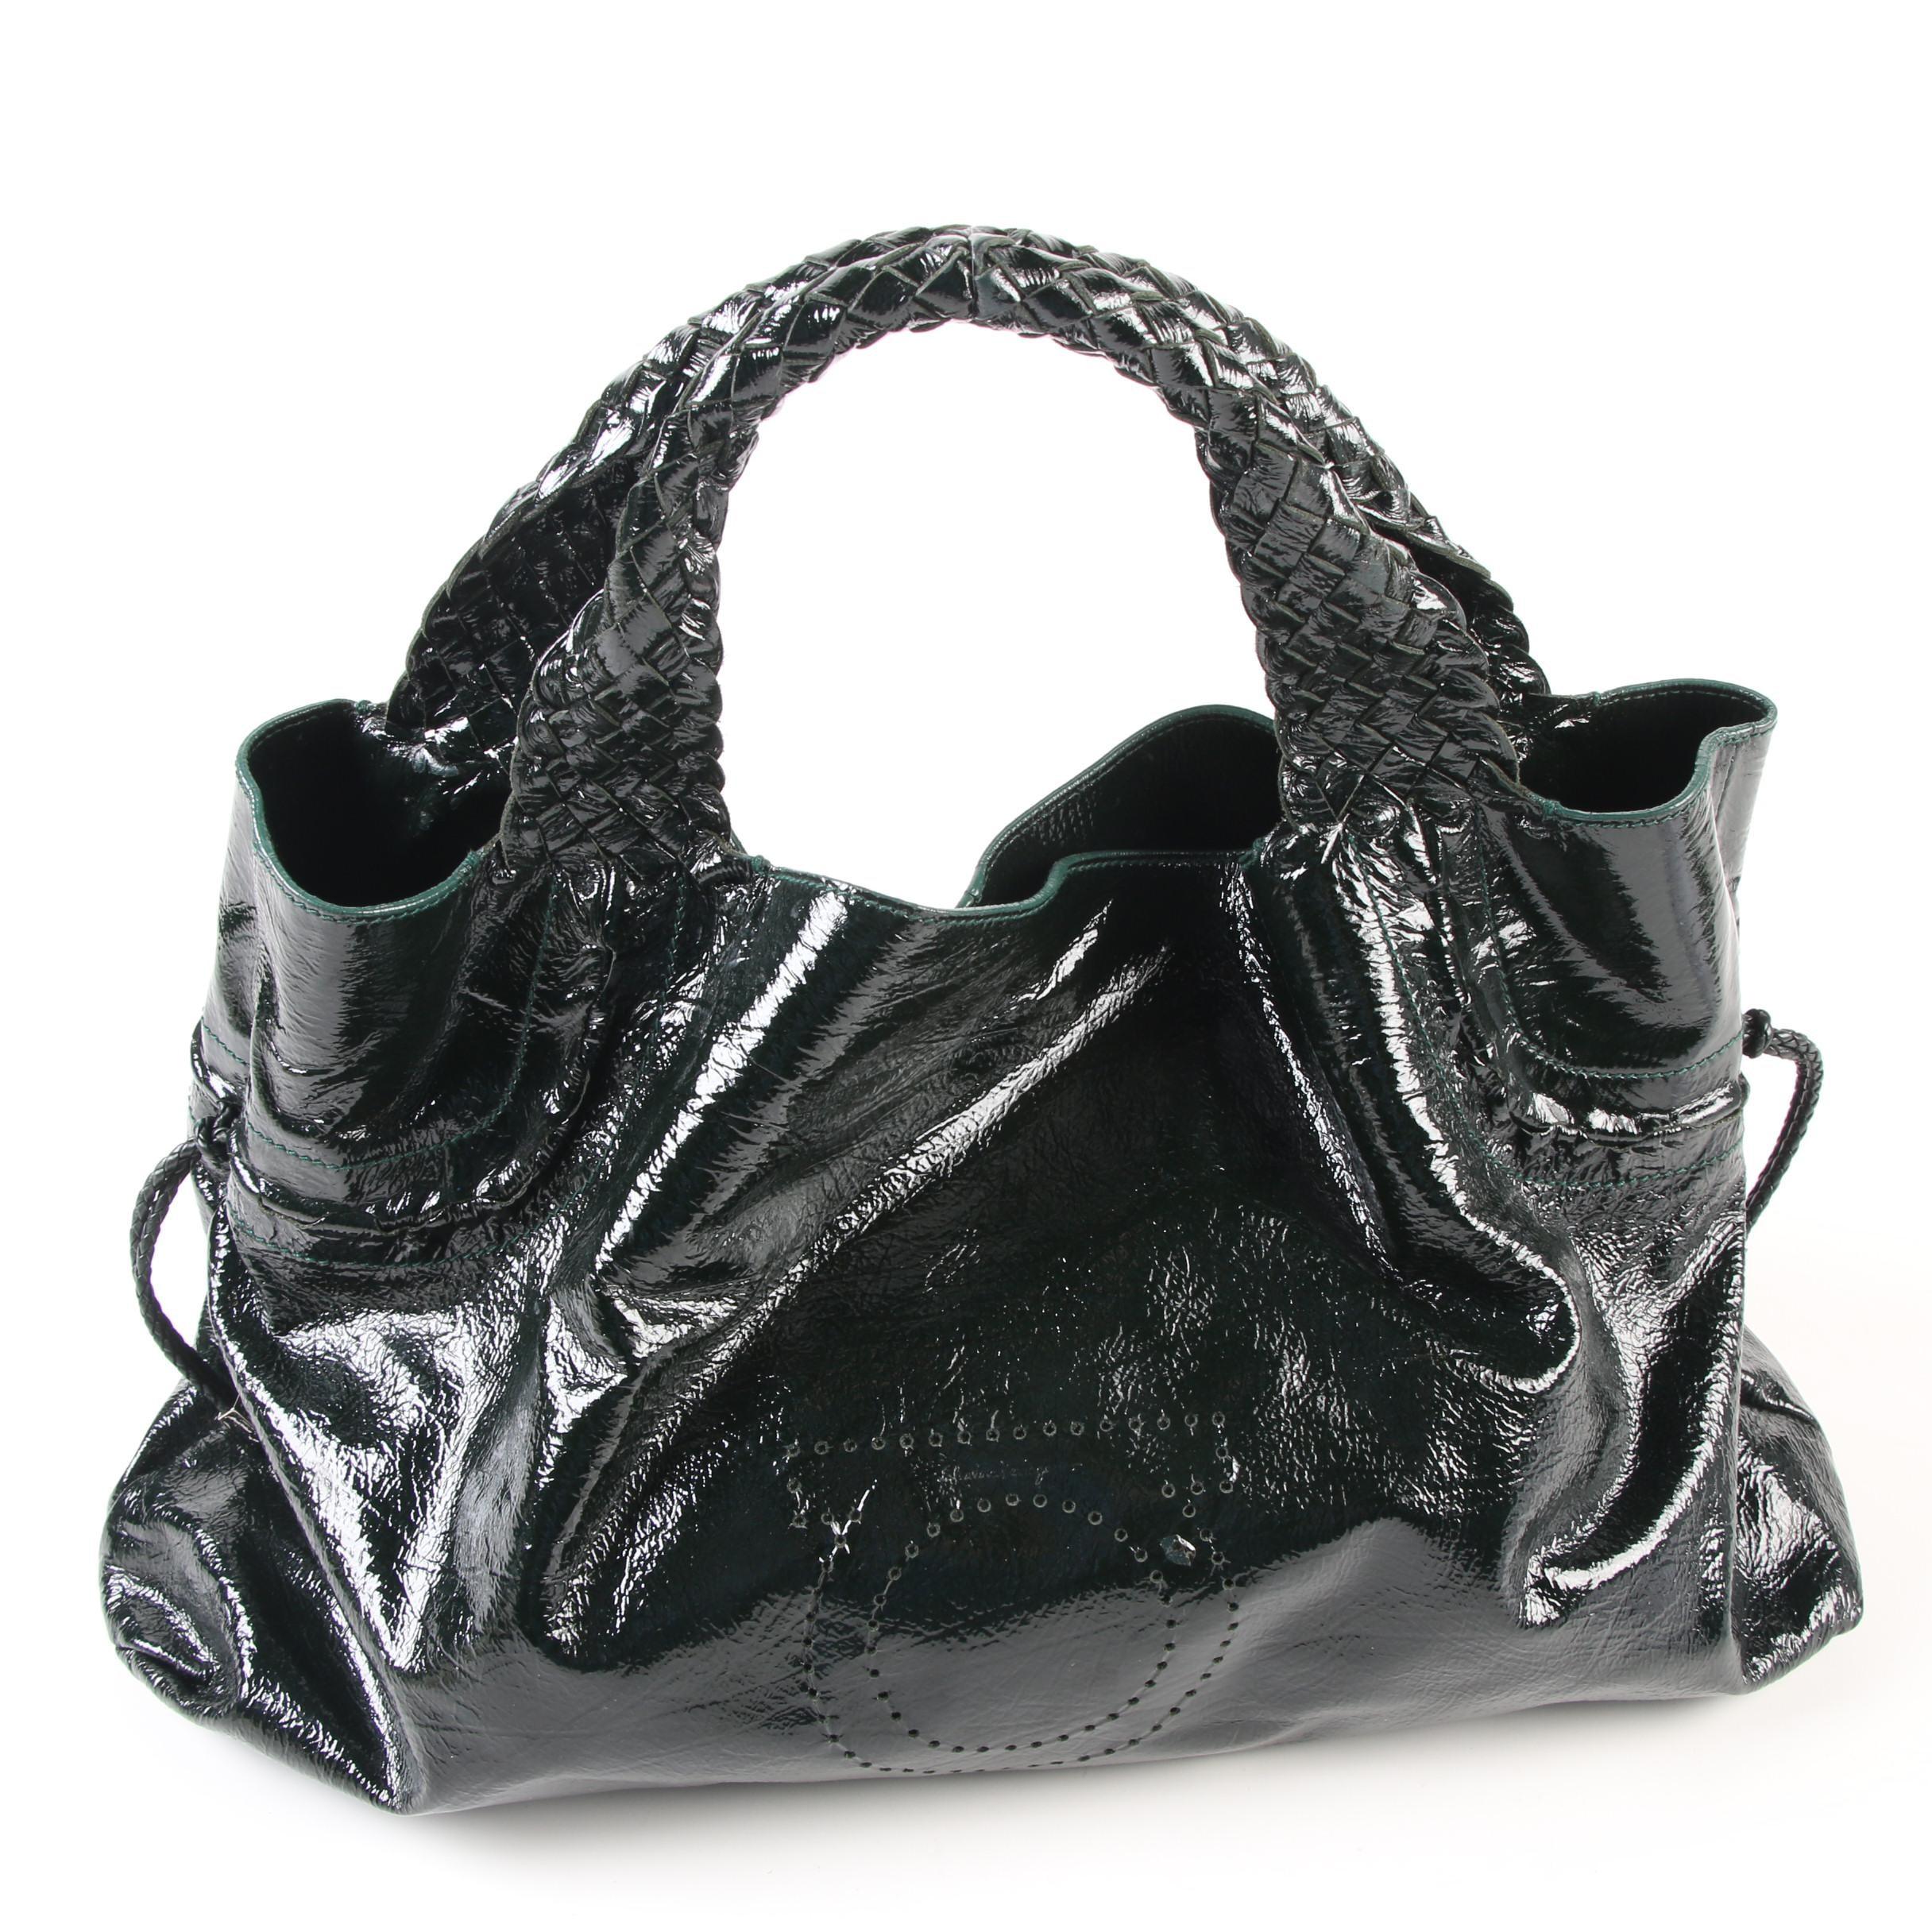 Salvatore Ferragamo Black Crinkle Patent Leather Bag with Braided Trim